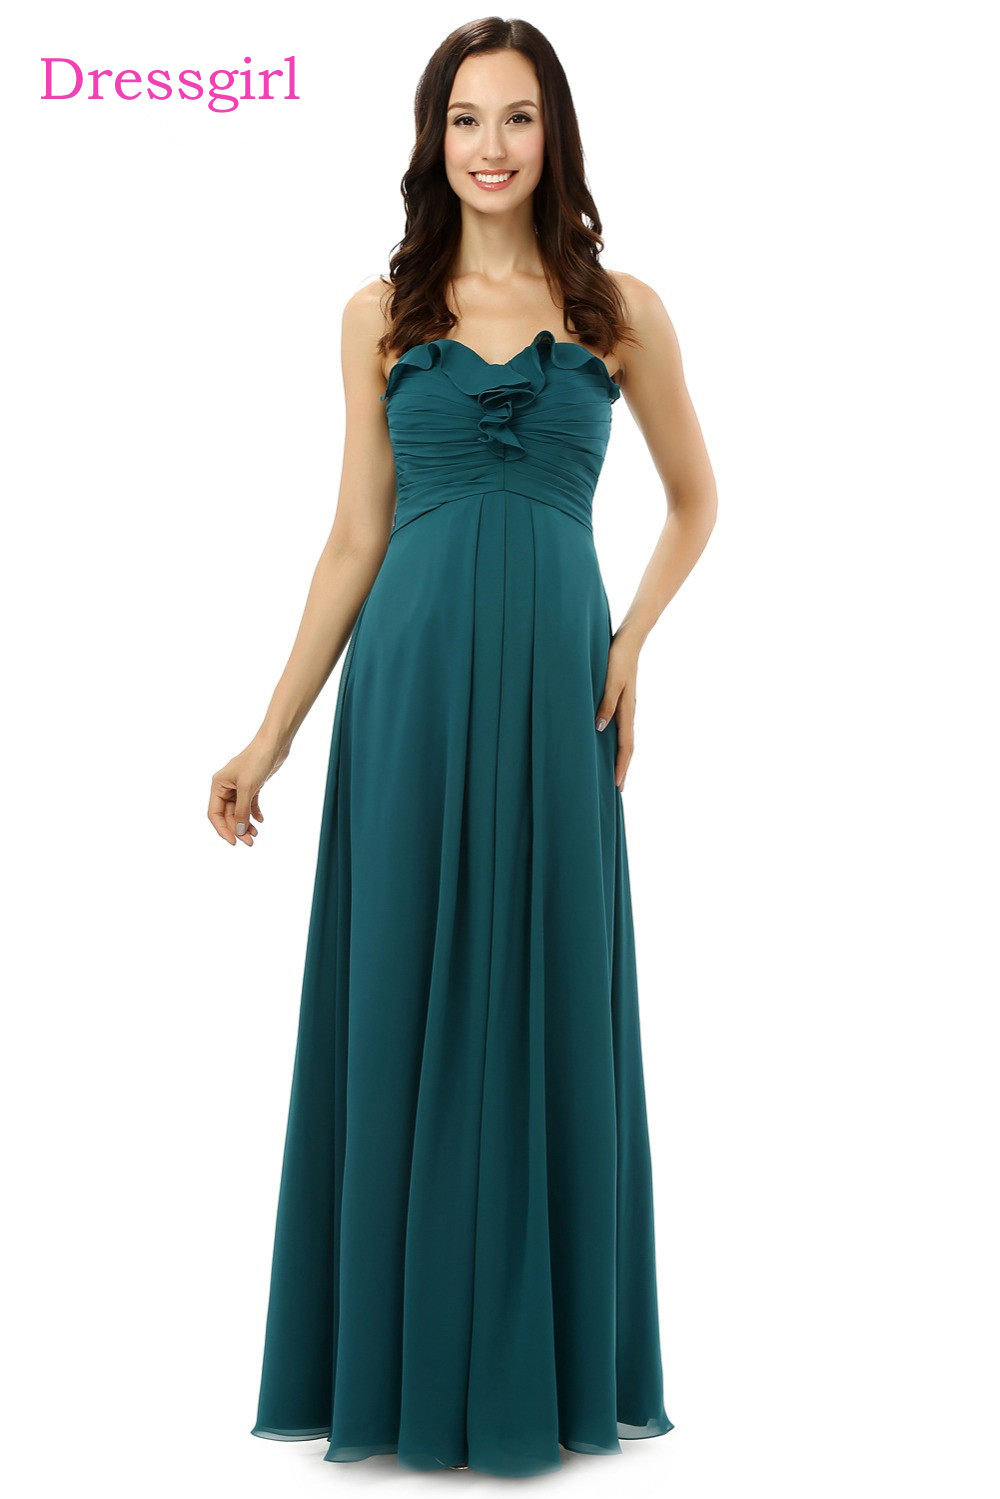 New 2018 Cheap Bridesmaid Dresses Under 50 A-line Sweetheart Floor Length Dark Green Chiffon Wedding Party Dresses